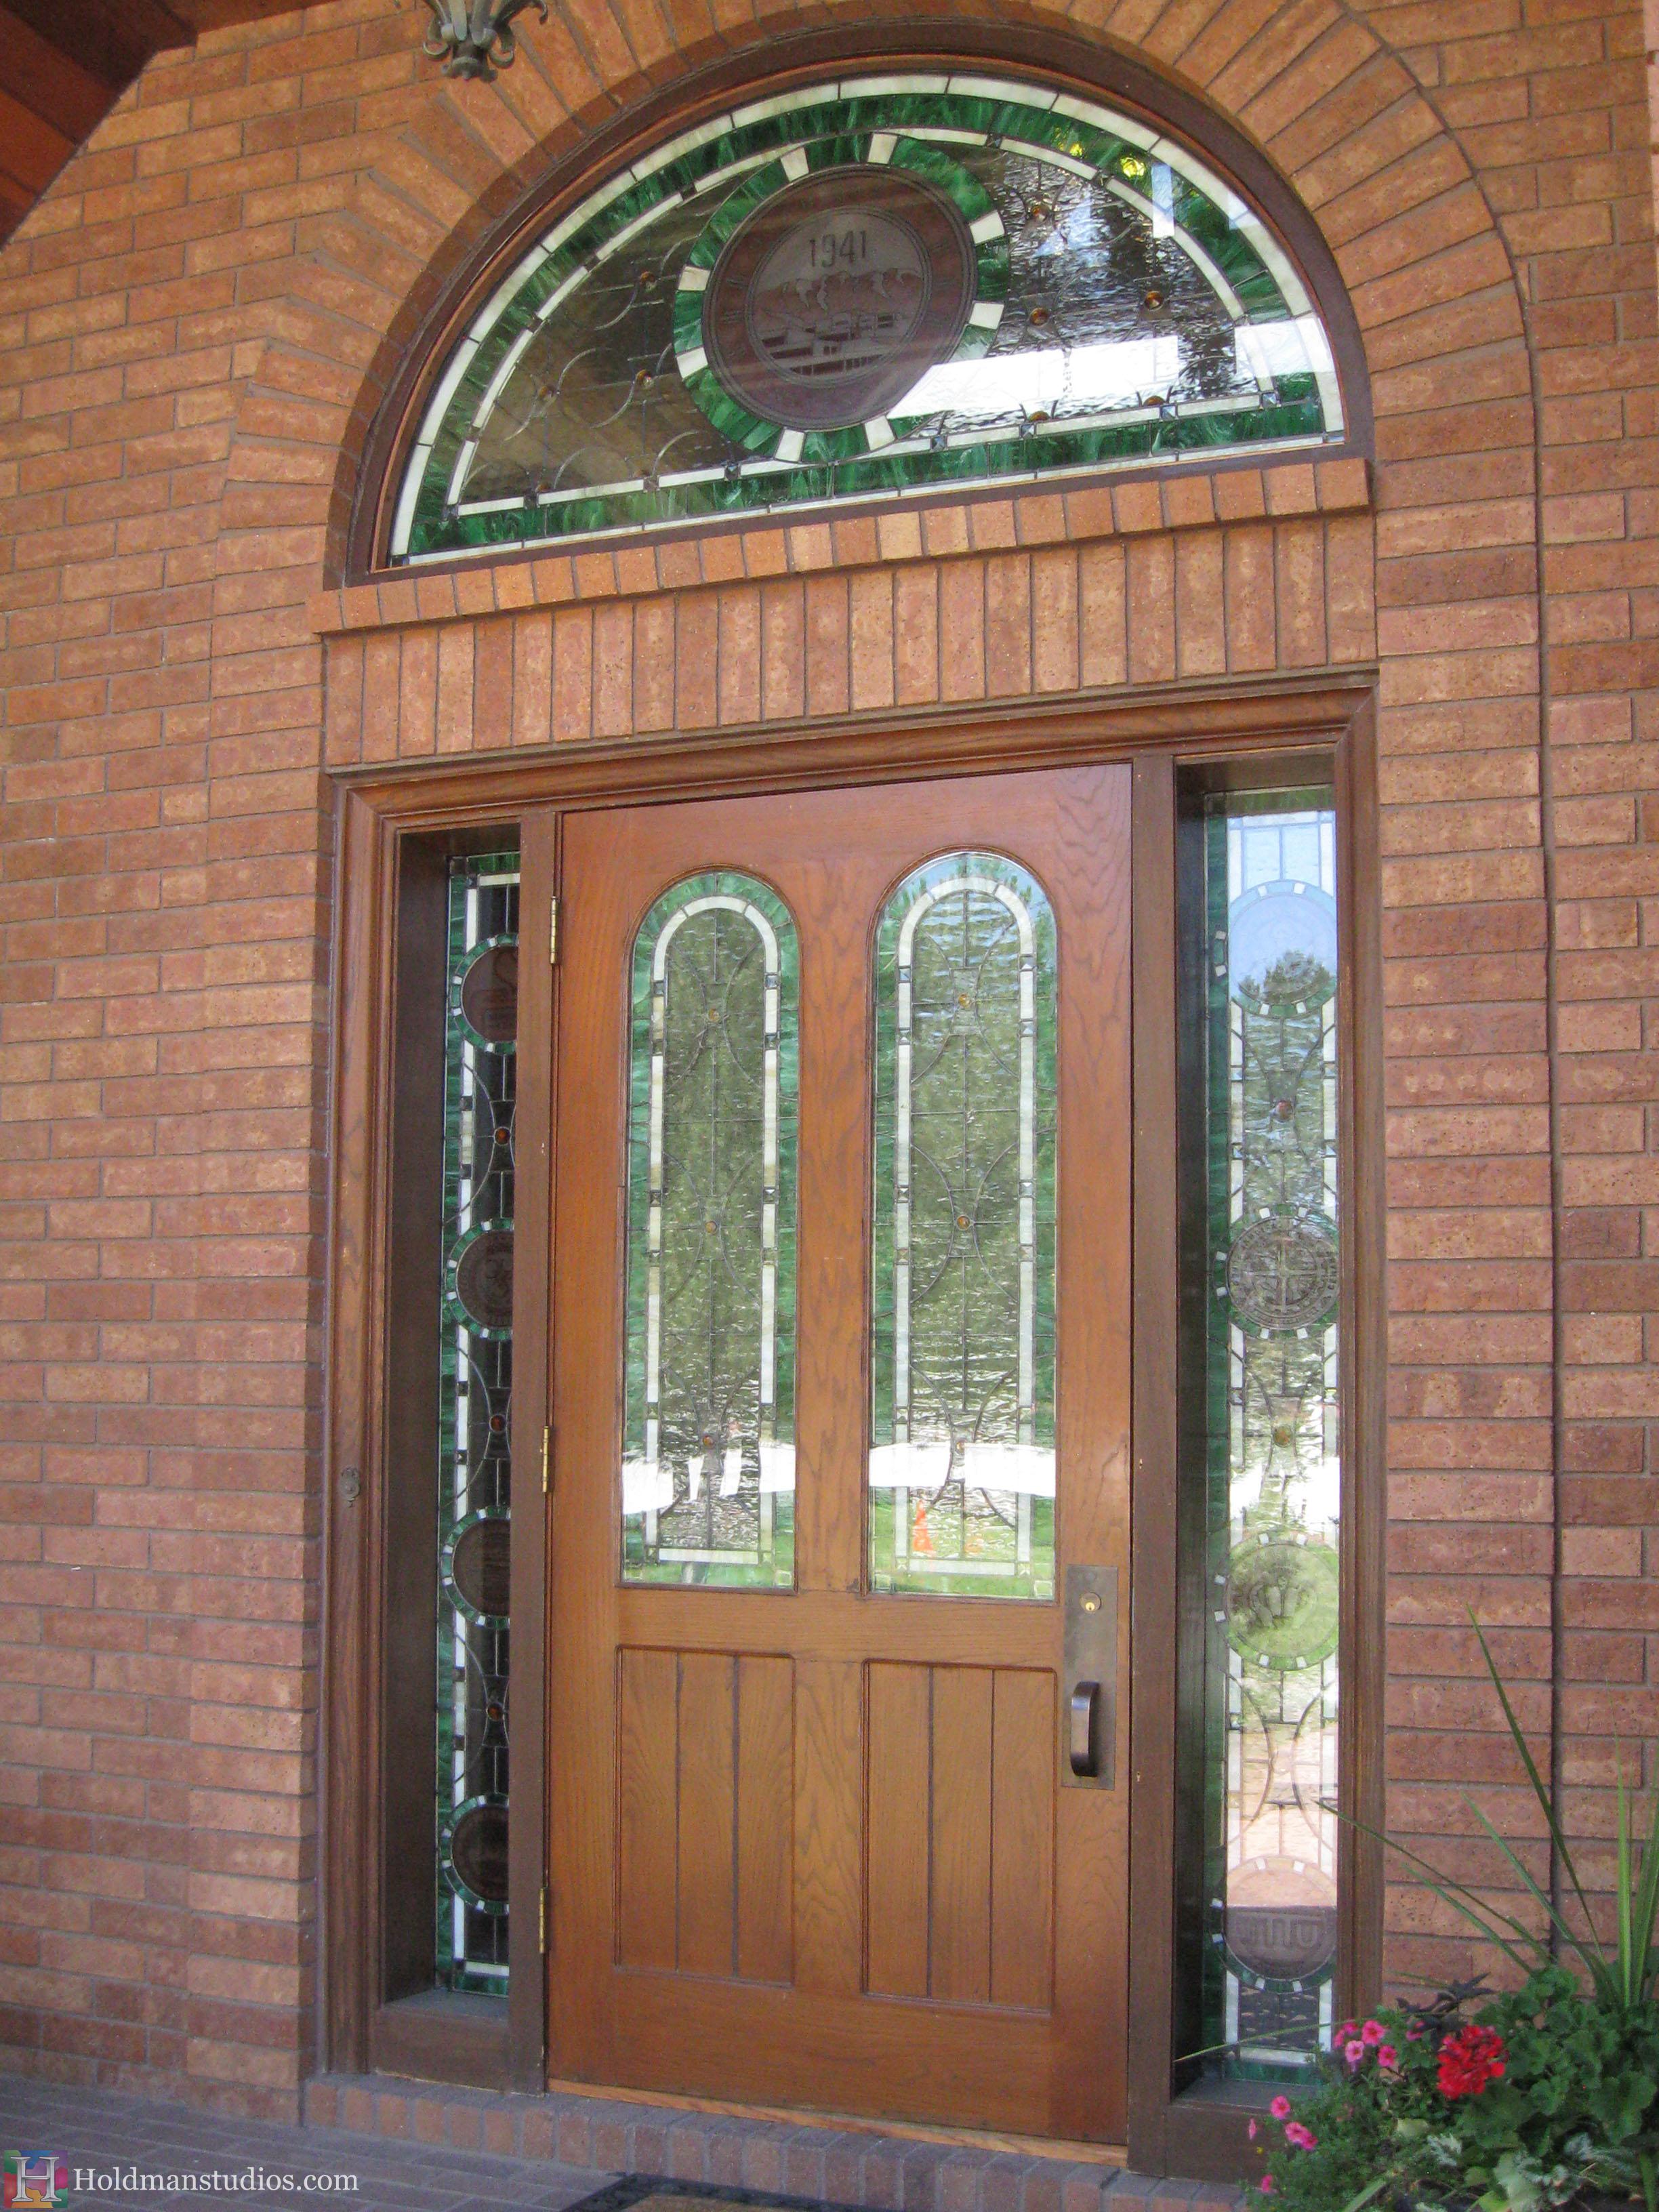 Holdman-studios-stained-glass-front-door-sidelight-transom-windows-utah-valley-university-alumni-house-outside-view.jpg